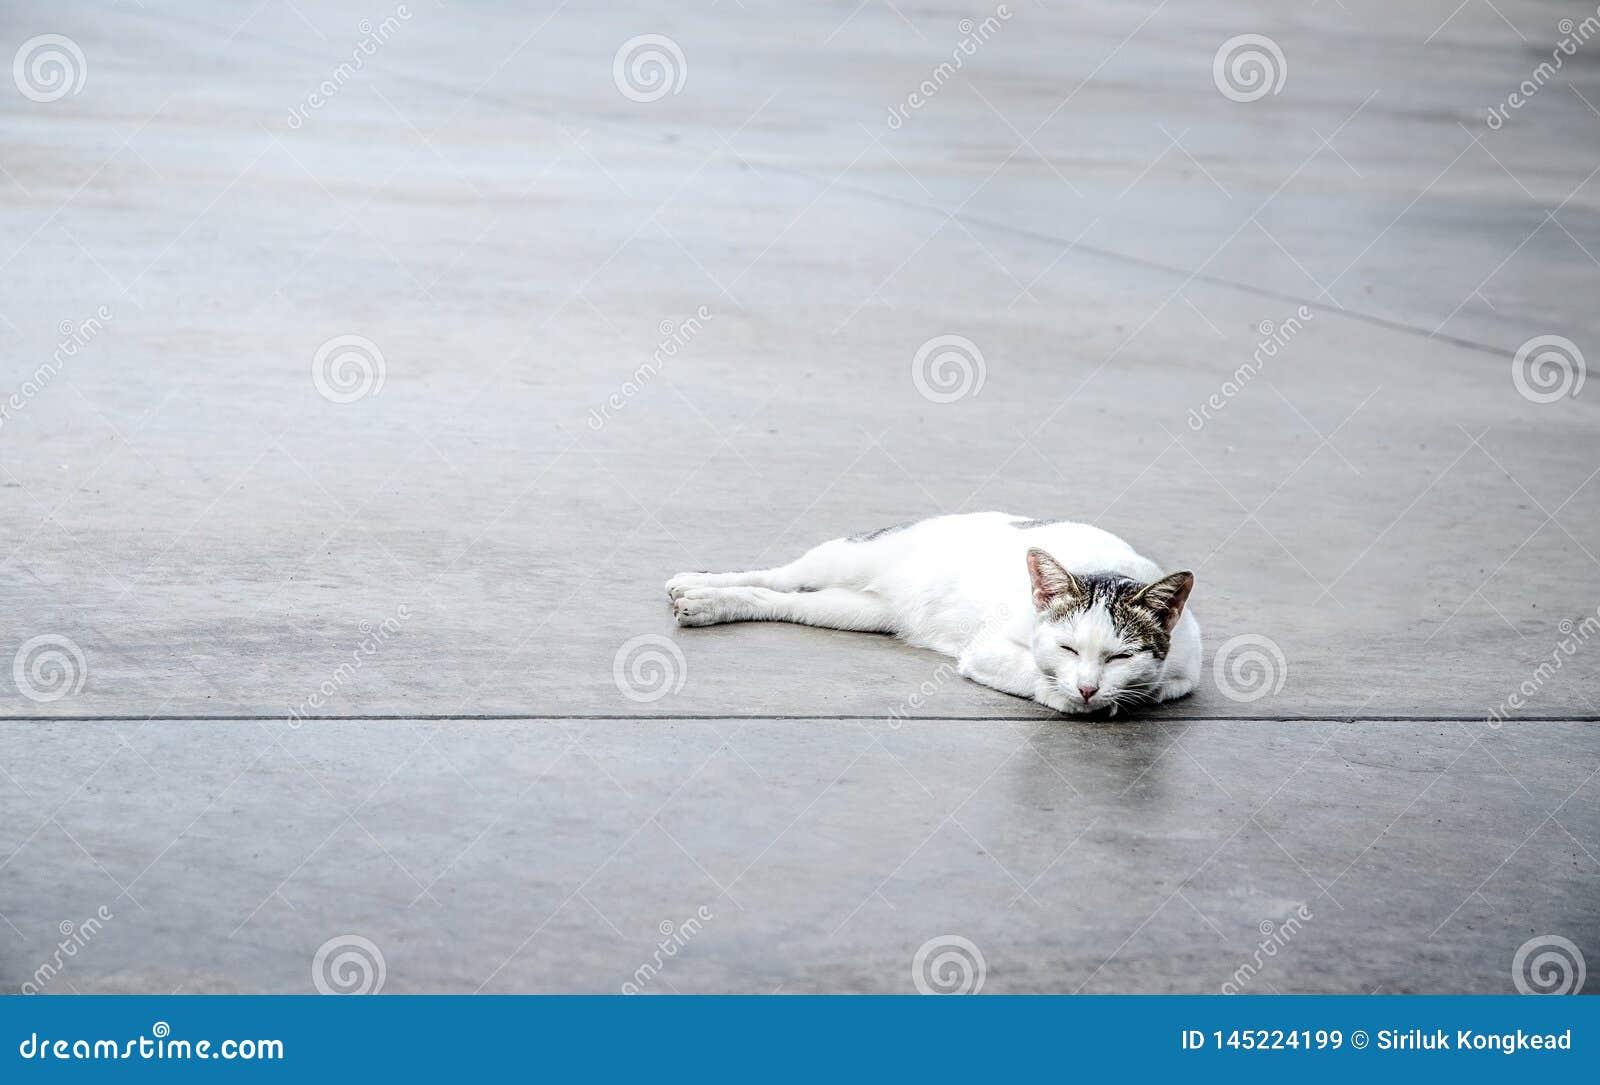 Cute white cat on the floor